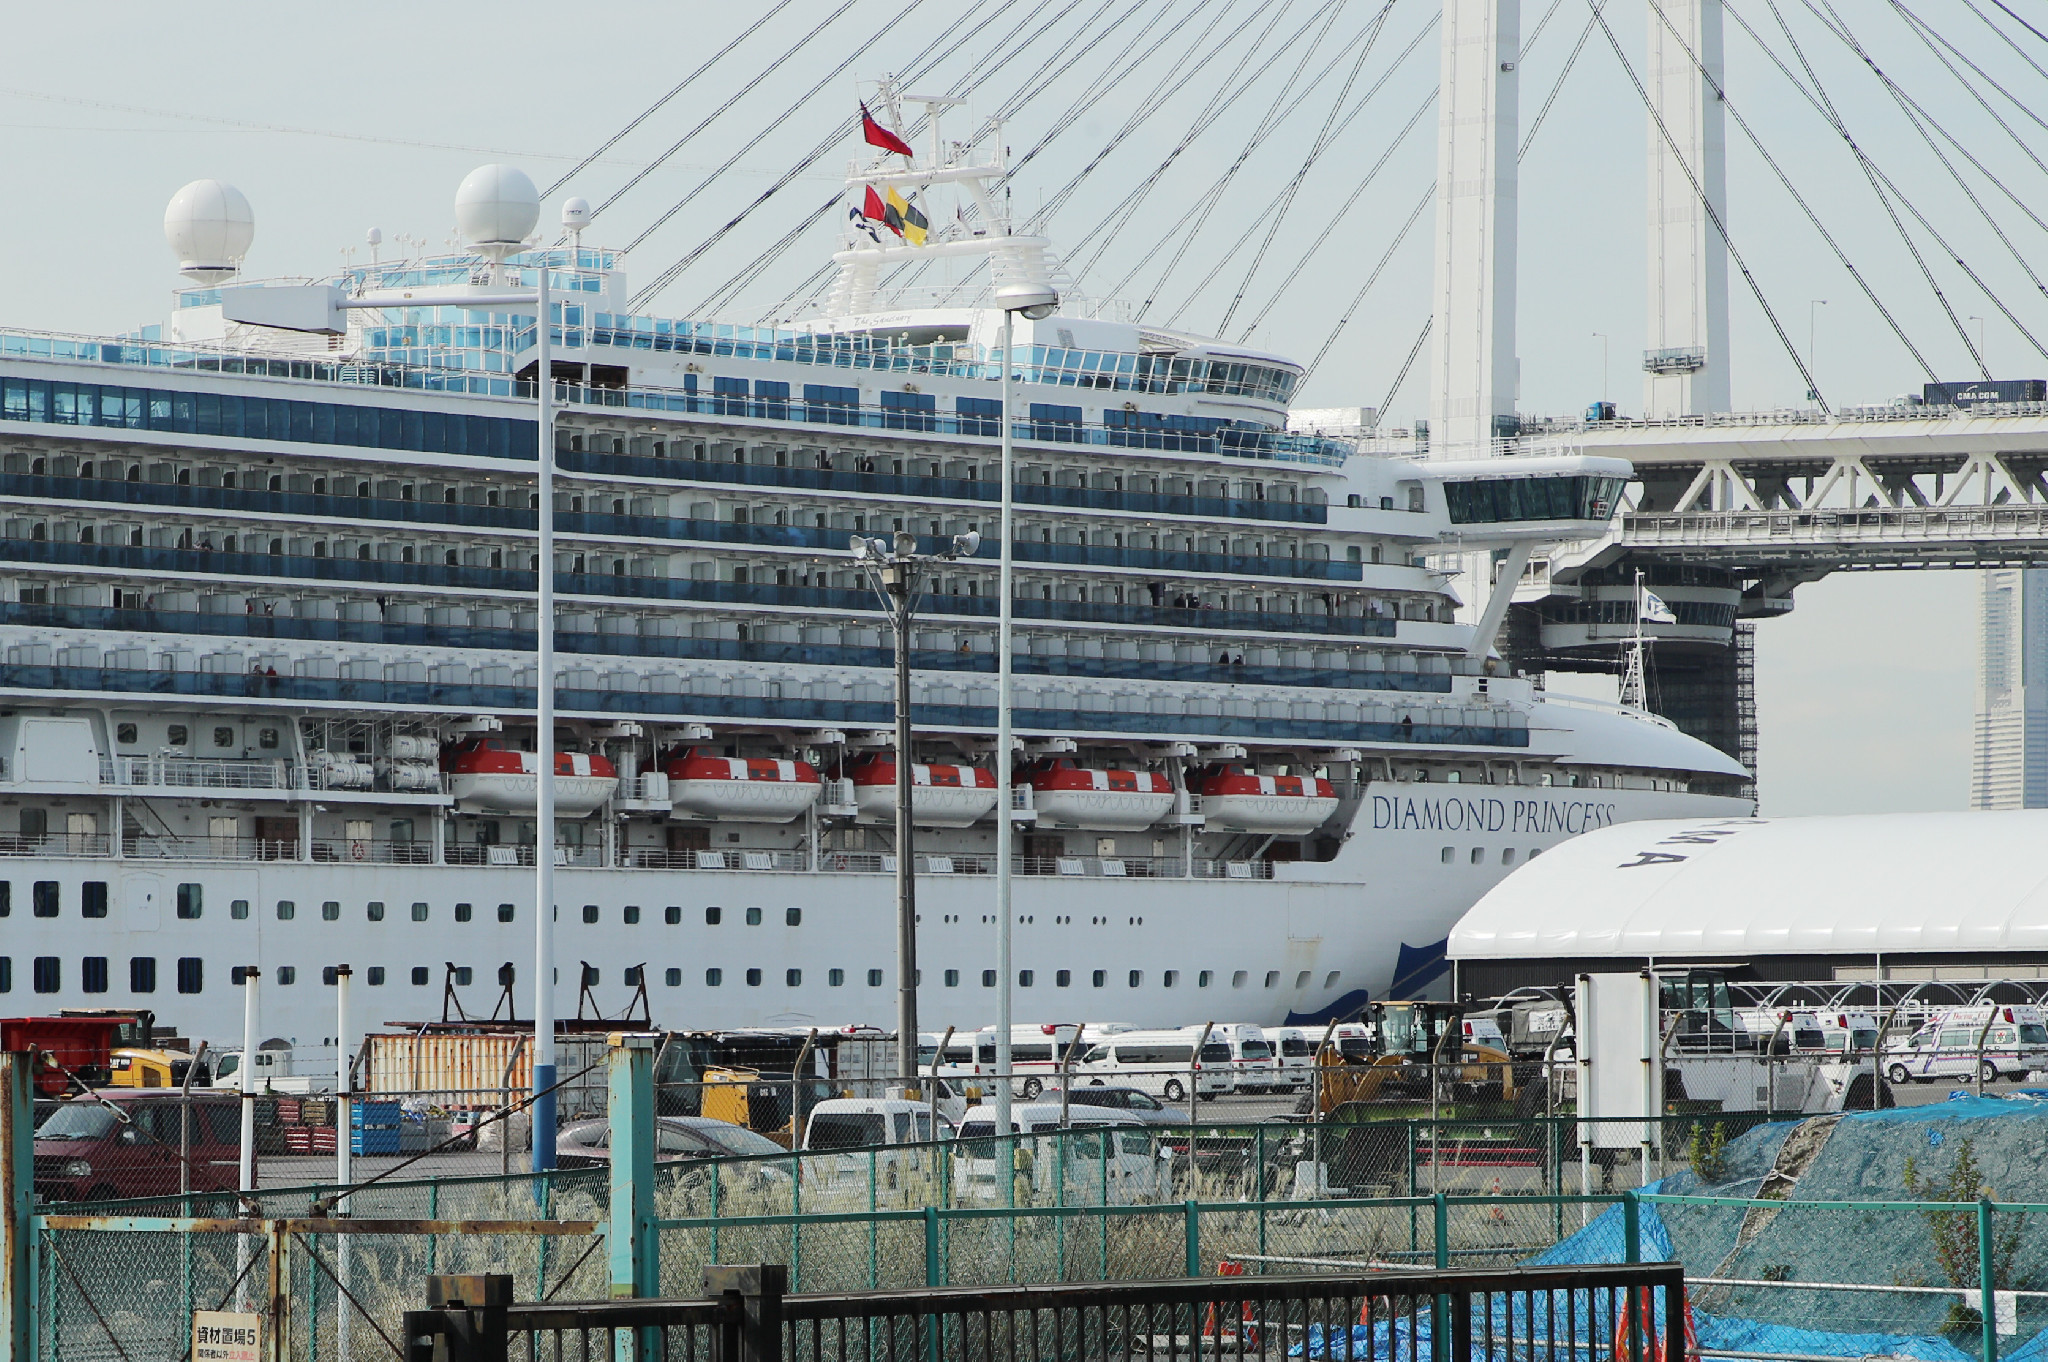 The Diamond Princess cruise ship anchored at Yokohama port on February 7, 2020.